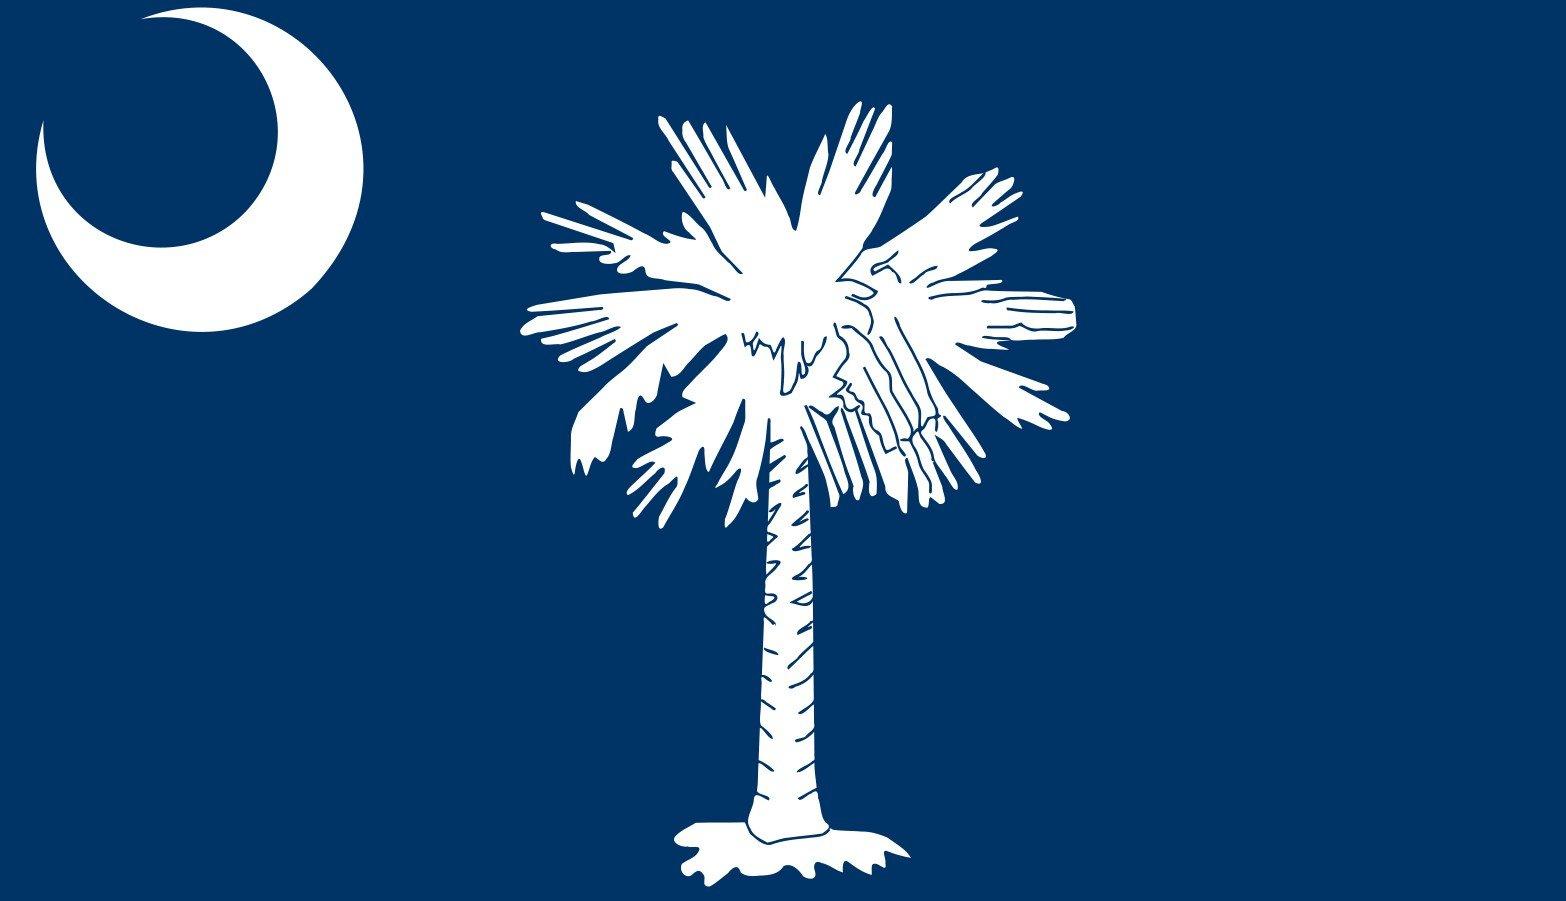 South Carolina State flag. (Source: AP Images)